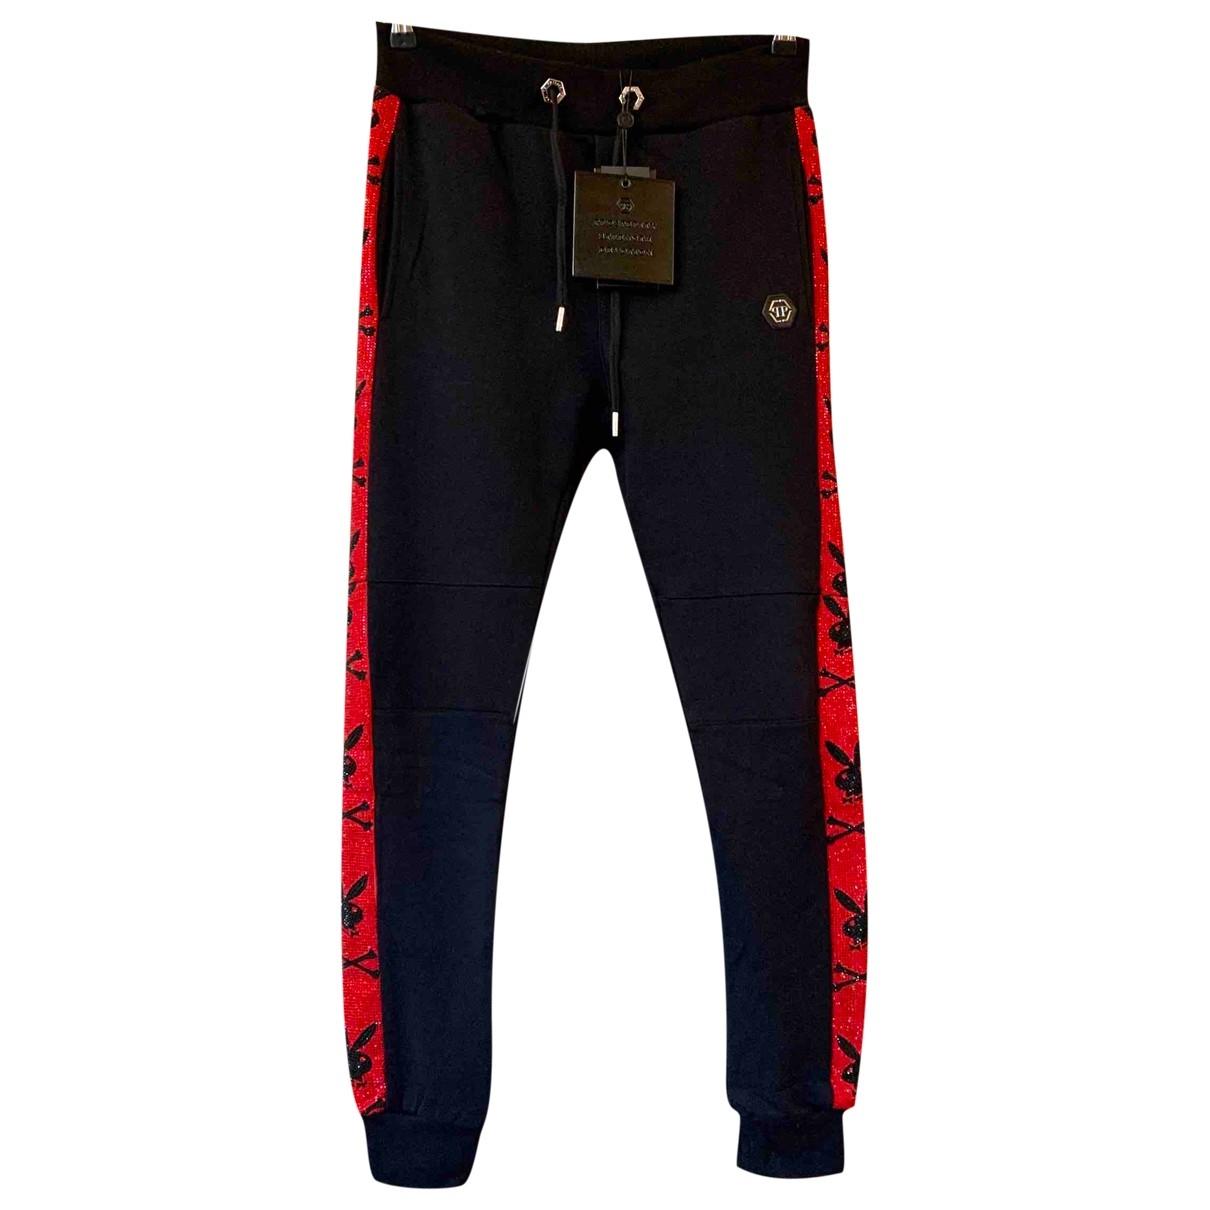 Philipp Plein \N Black Cotton Trousers for Women M International